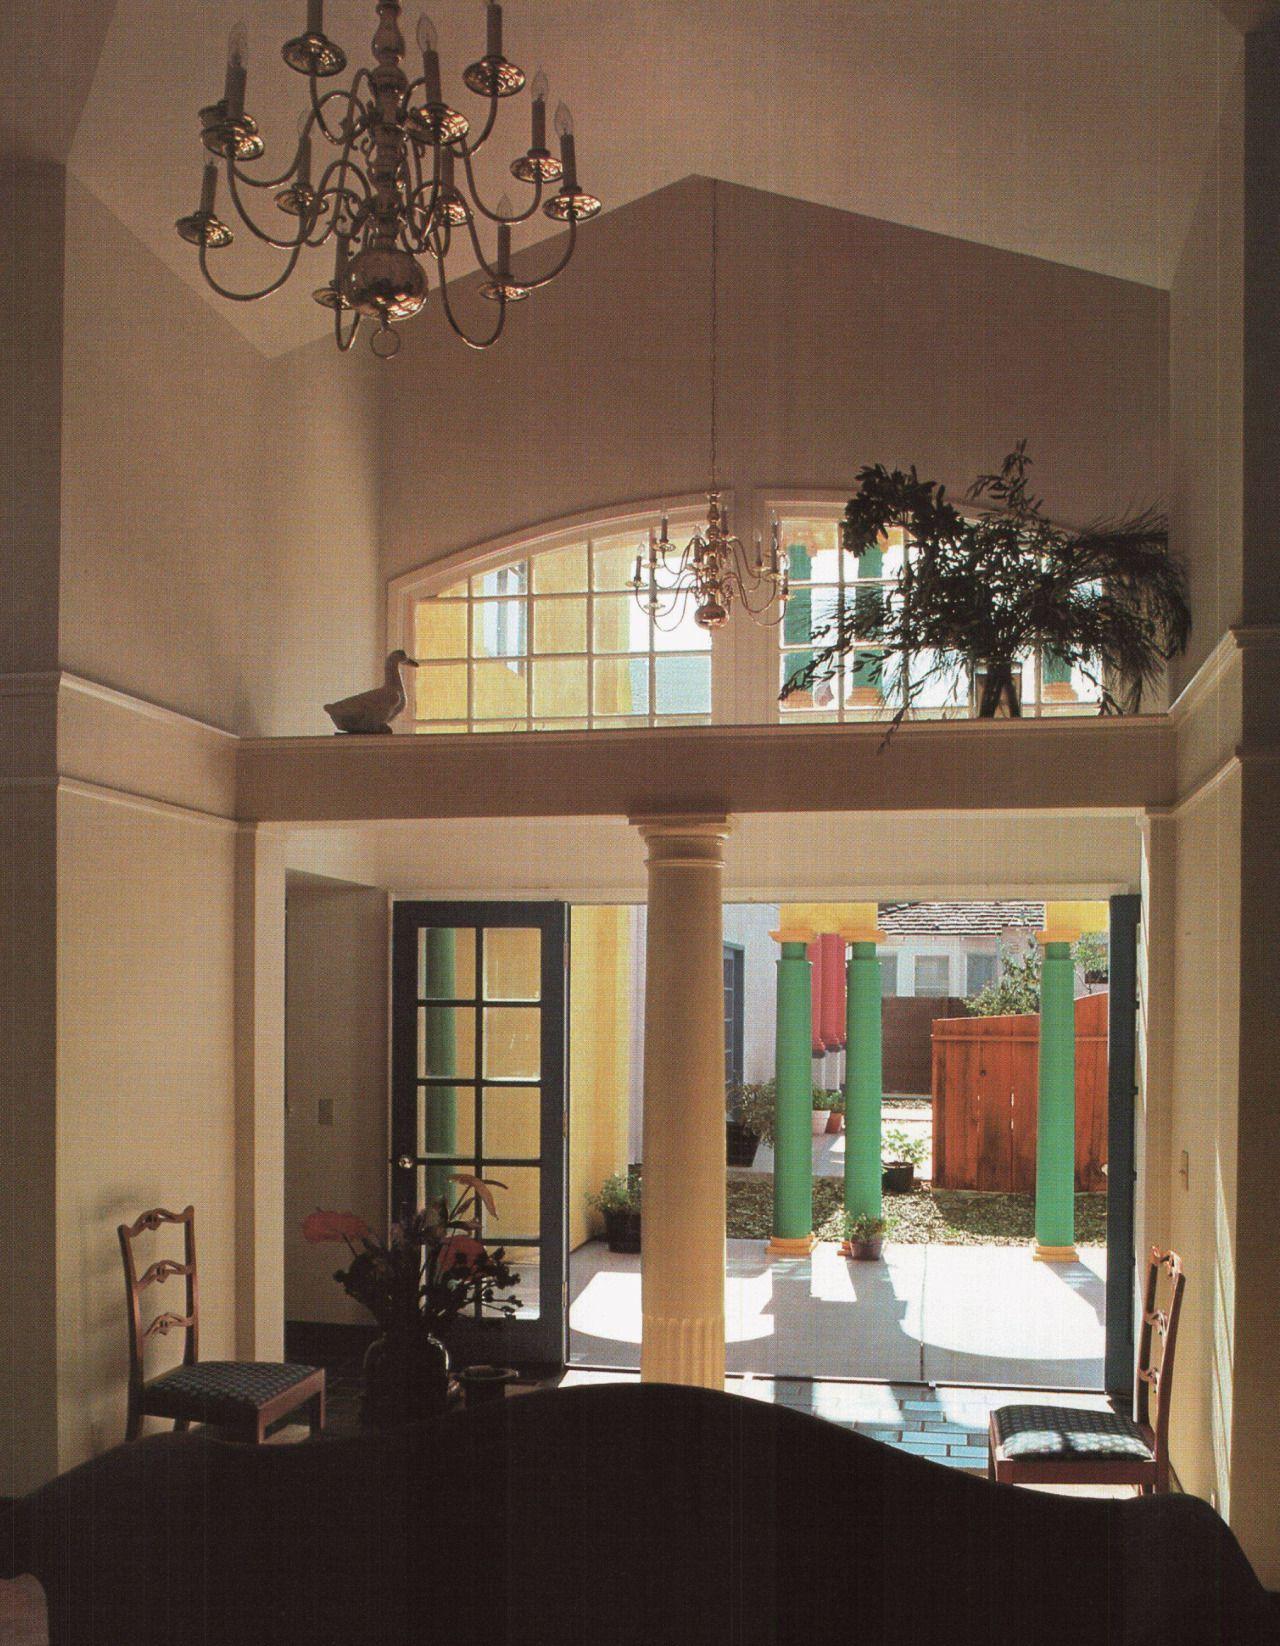 Thomas Gordon Smith, Tuscan House And Laurentian House, Livermore, California